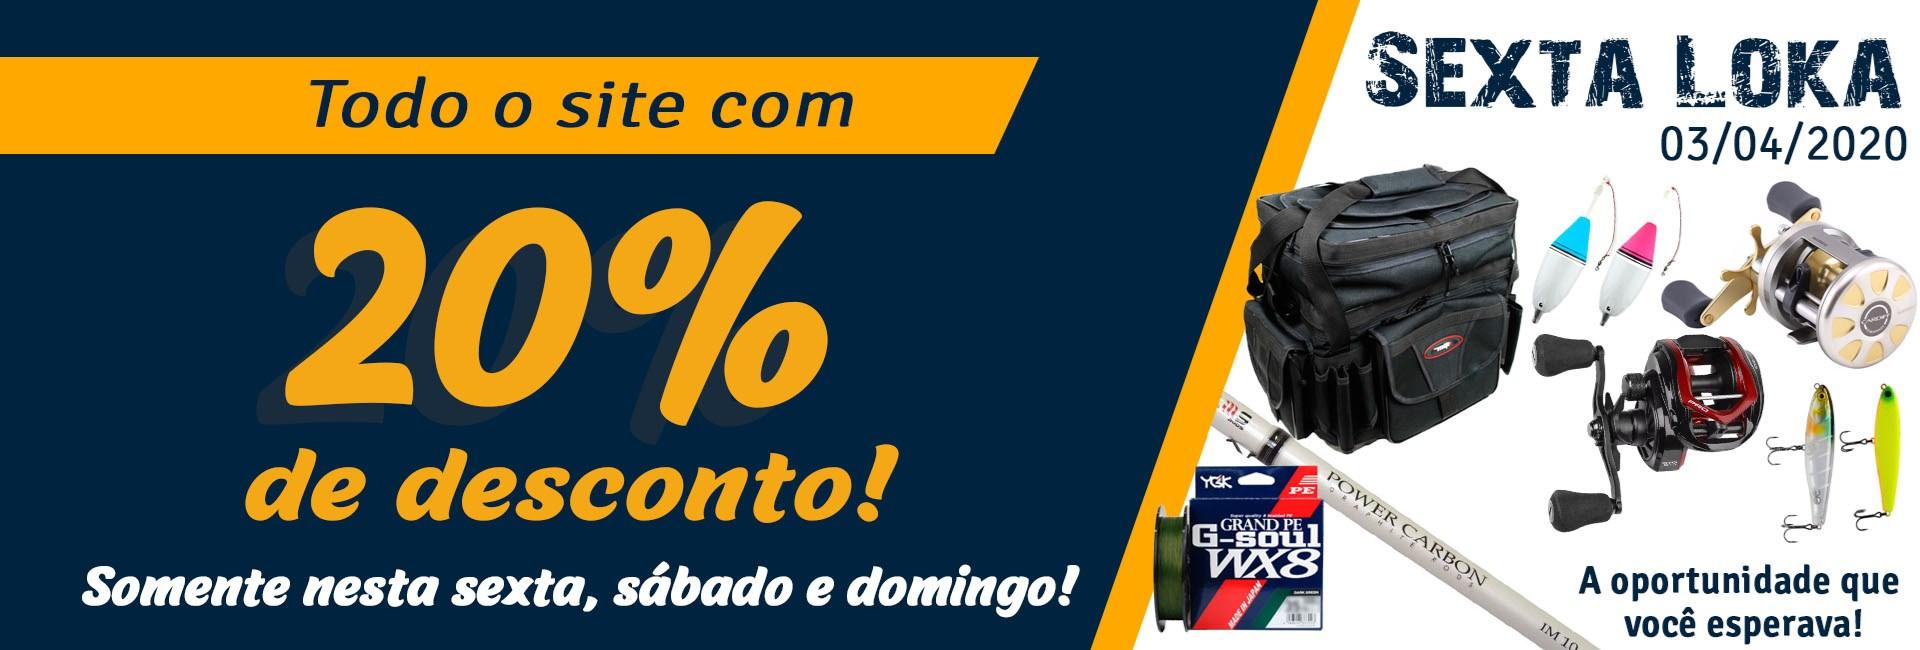 Sexta LOKA Promoção 20% 03/04/2020